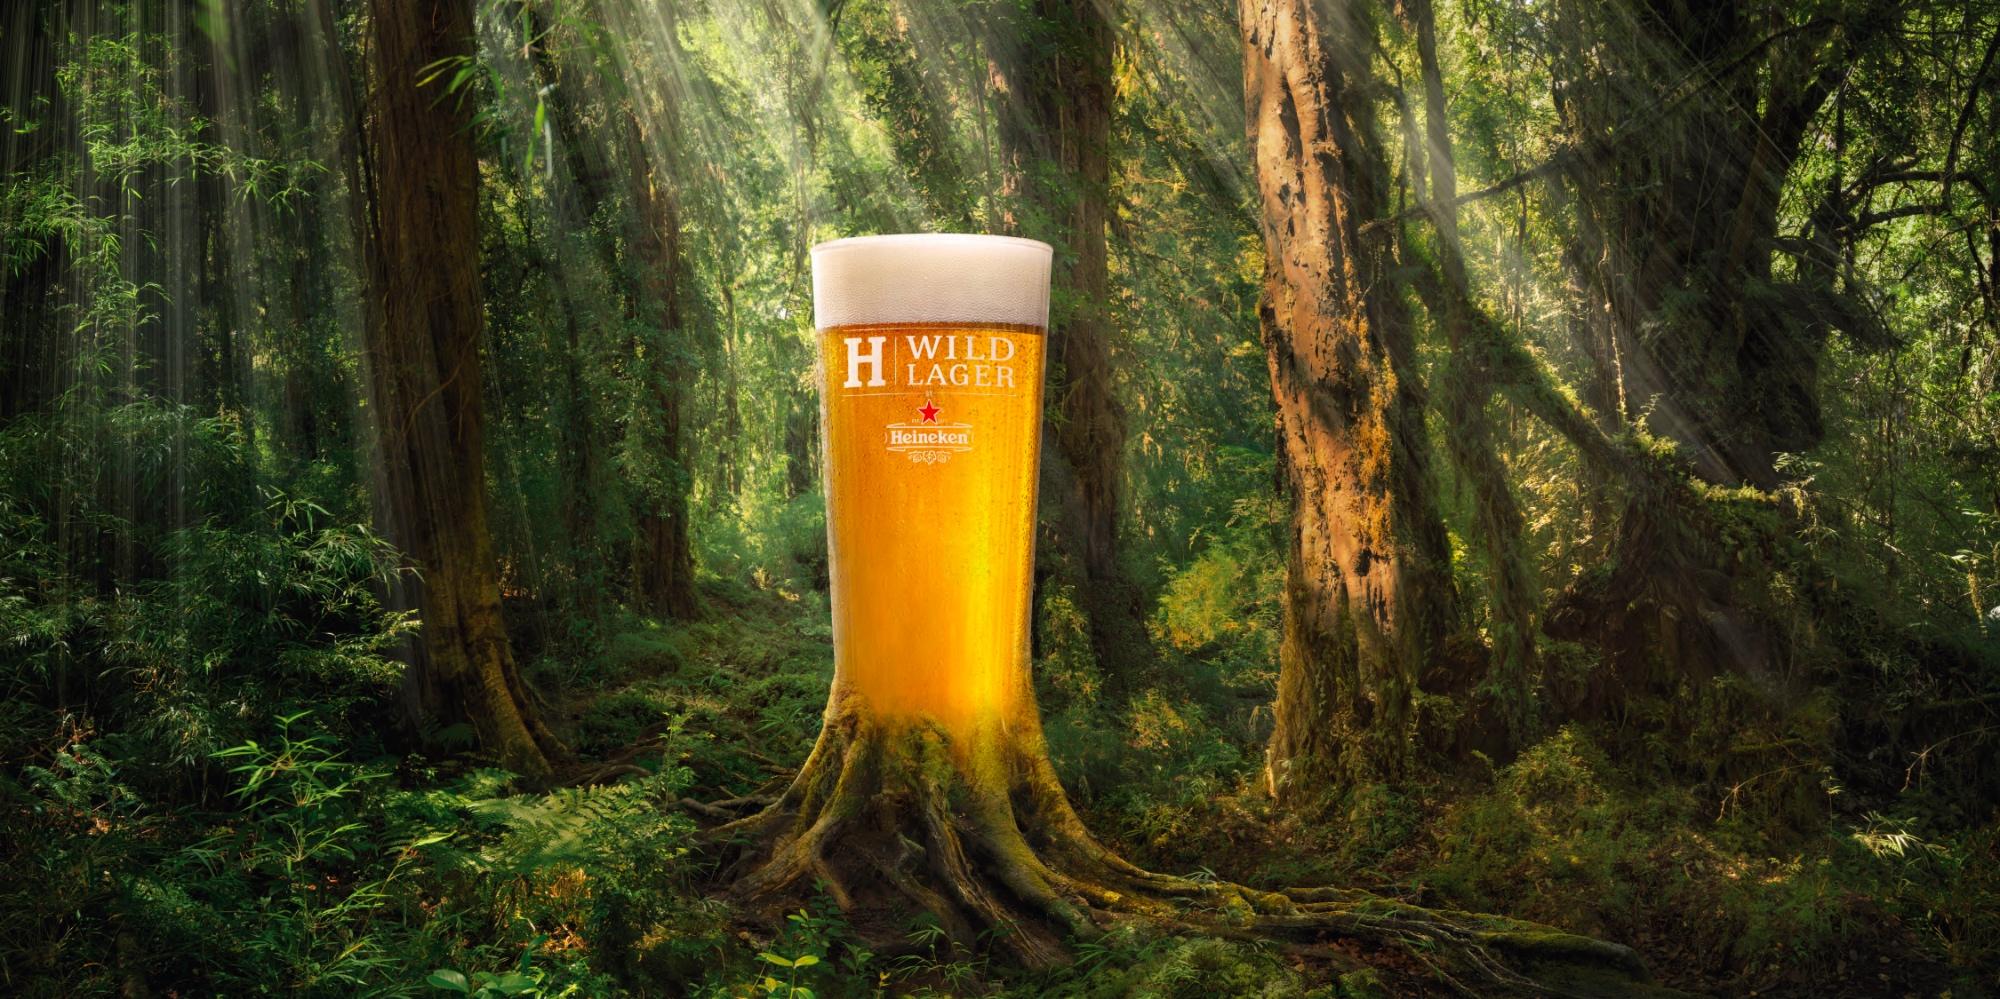 Heineken Launches Limited Release 'h41' Wild Lager photo